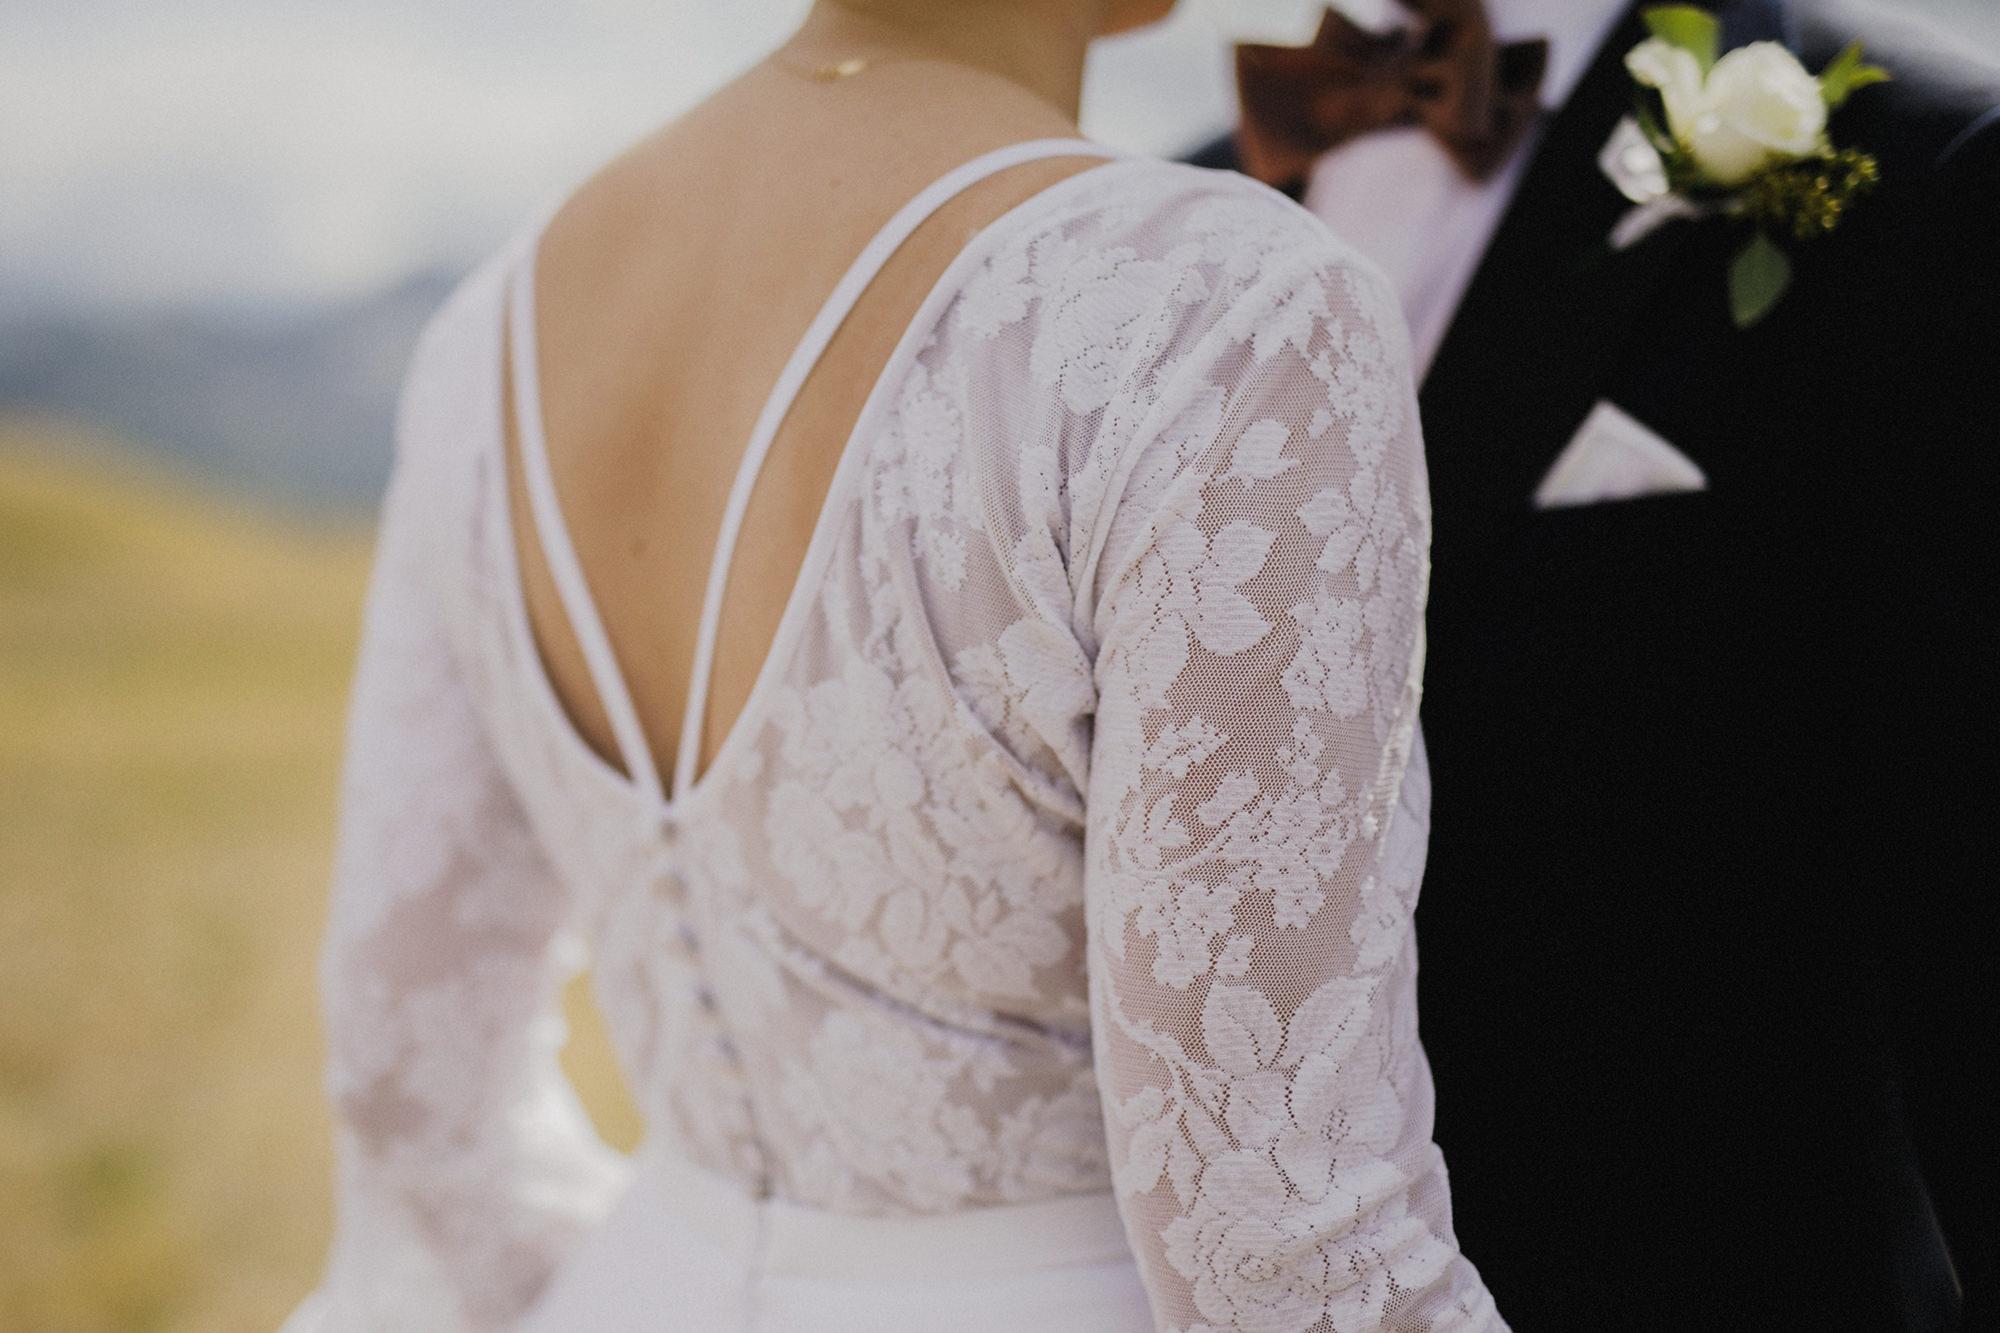 Waterton Wedding David Guenther -09.JPG